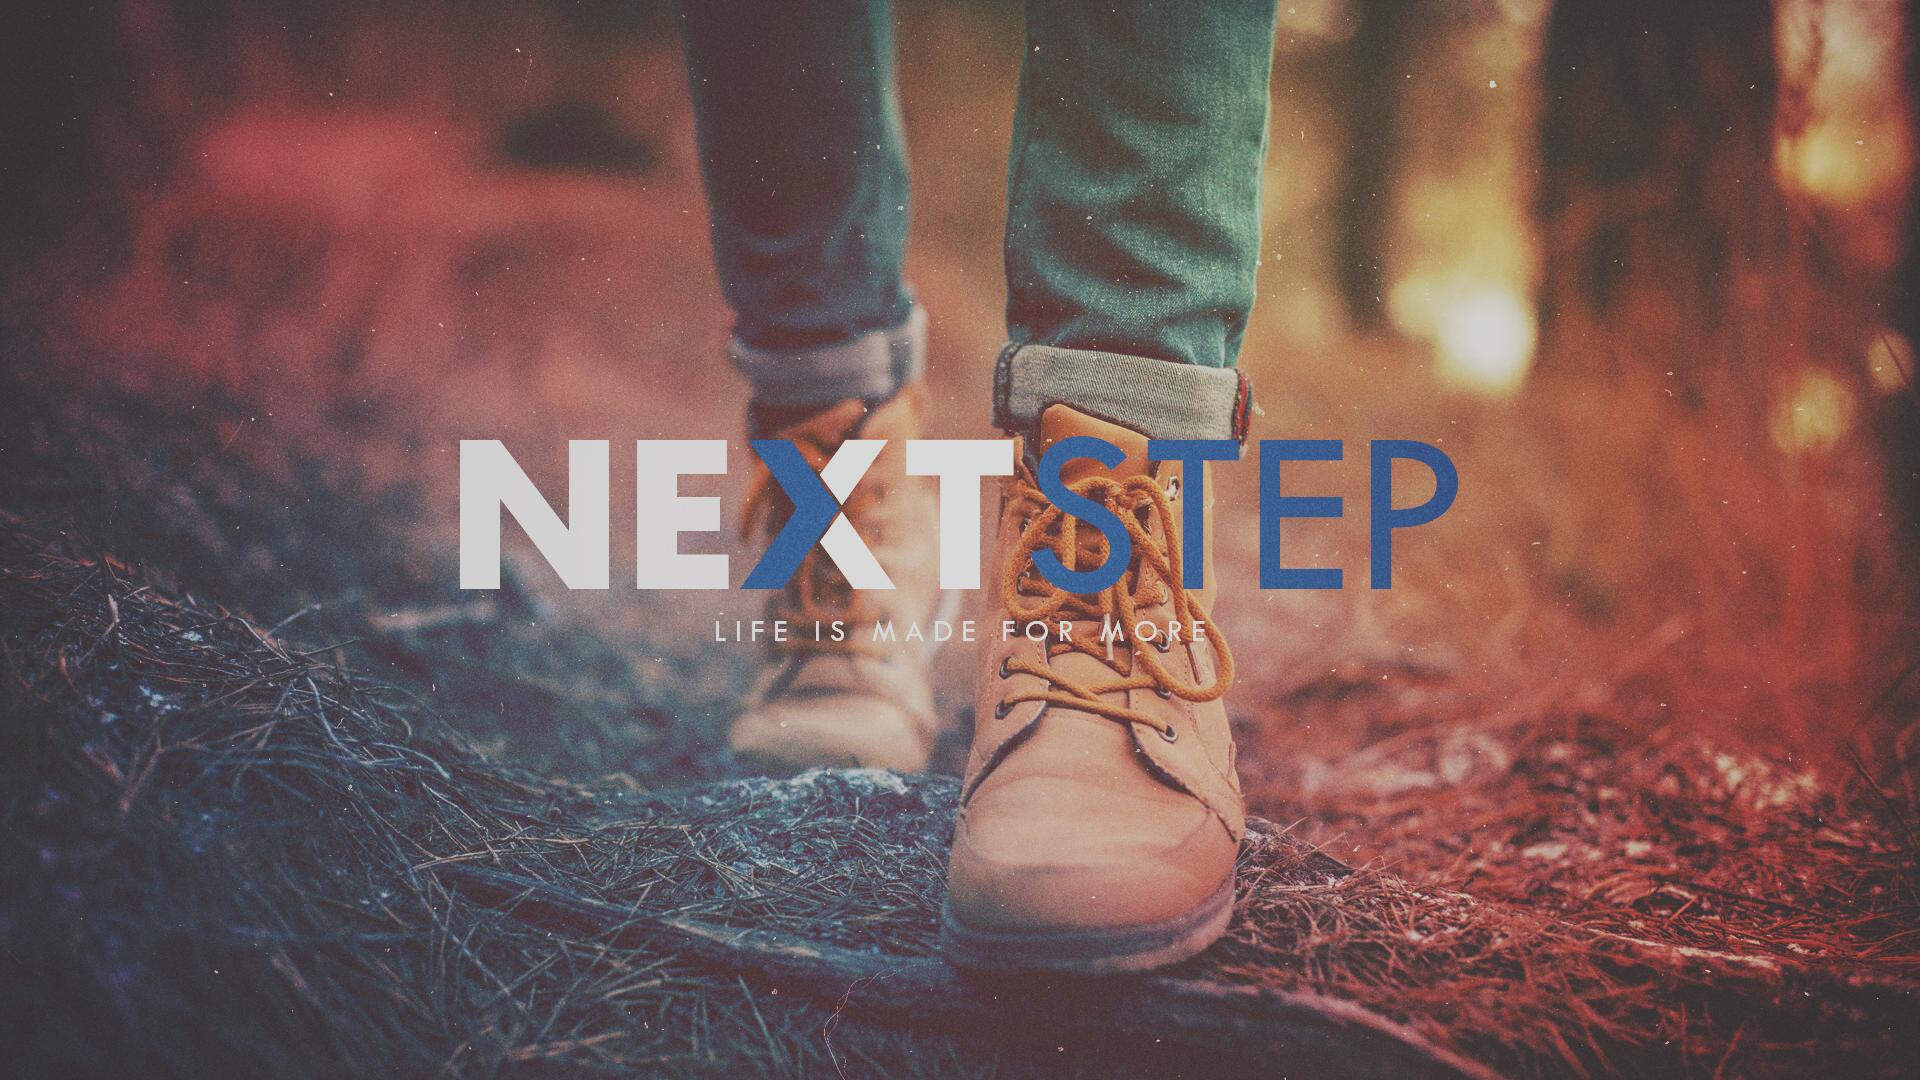 Next Step Title